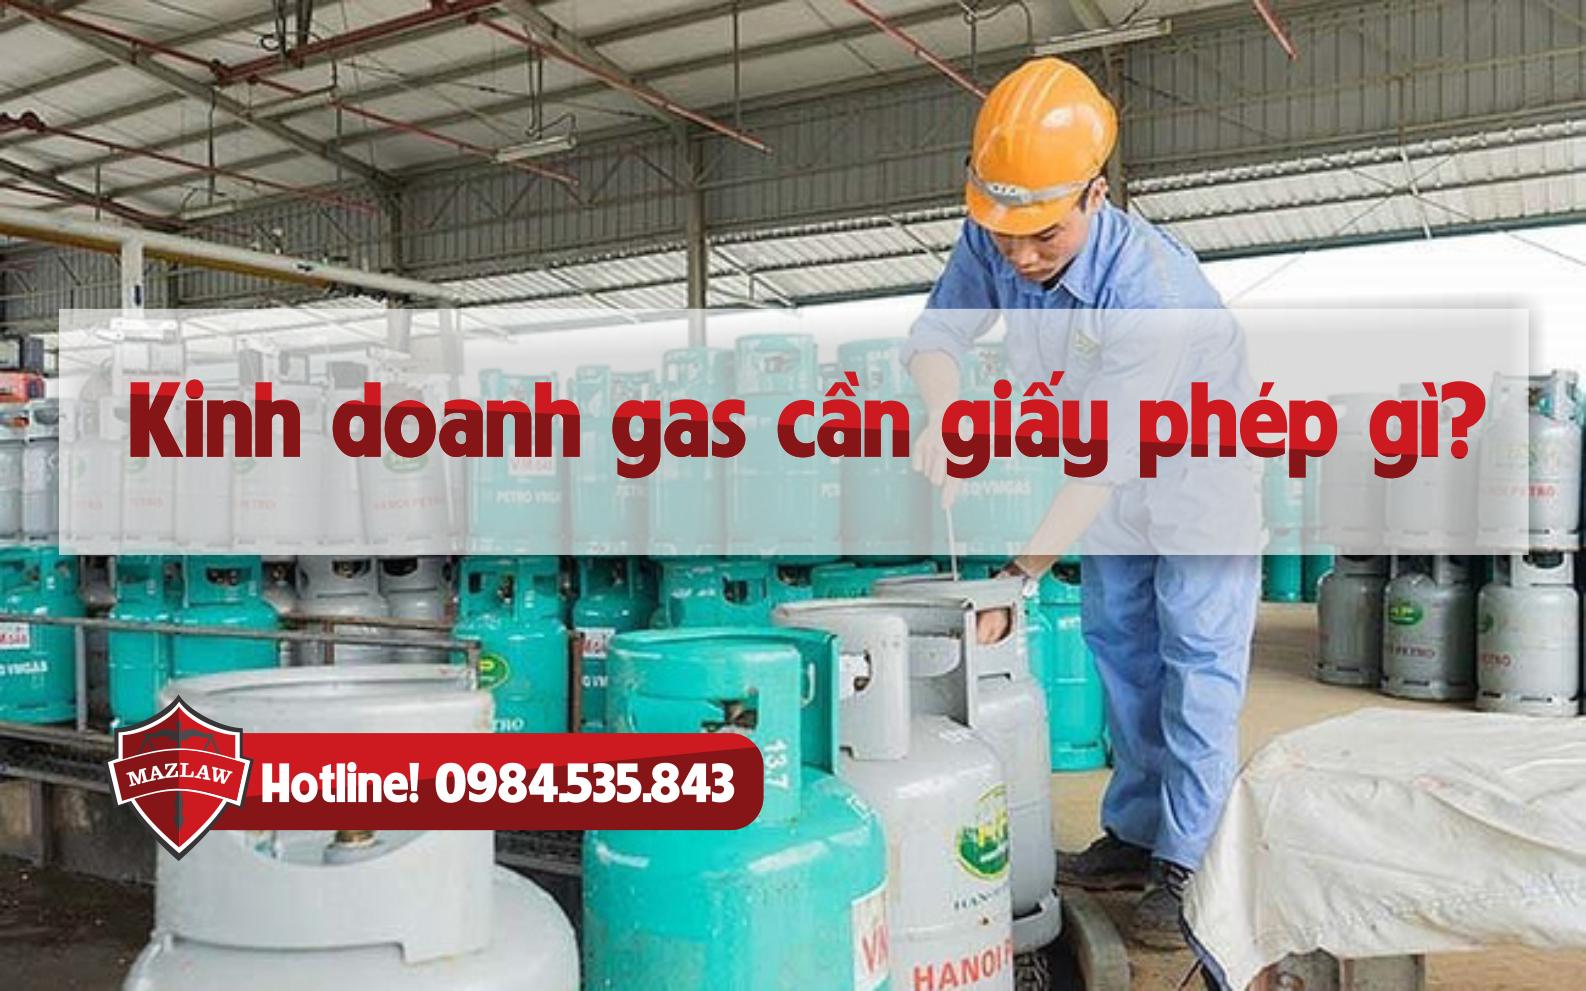 Kinh doanh gas cần giấy phép gì?